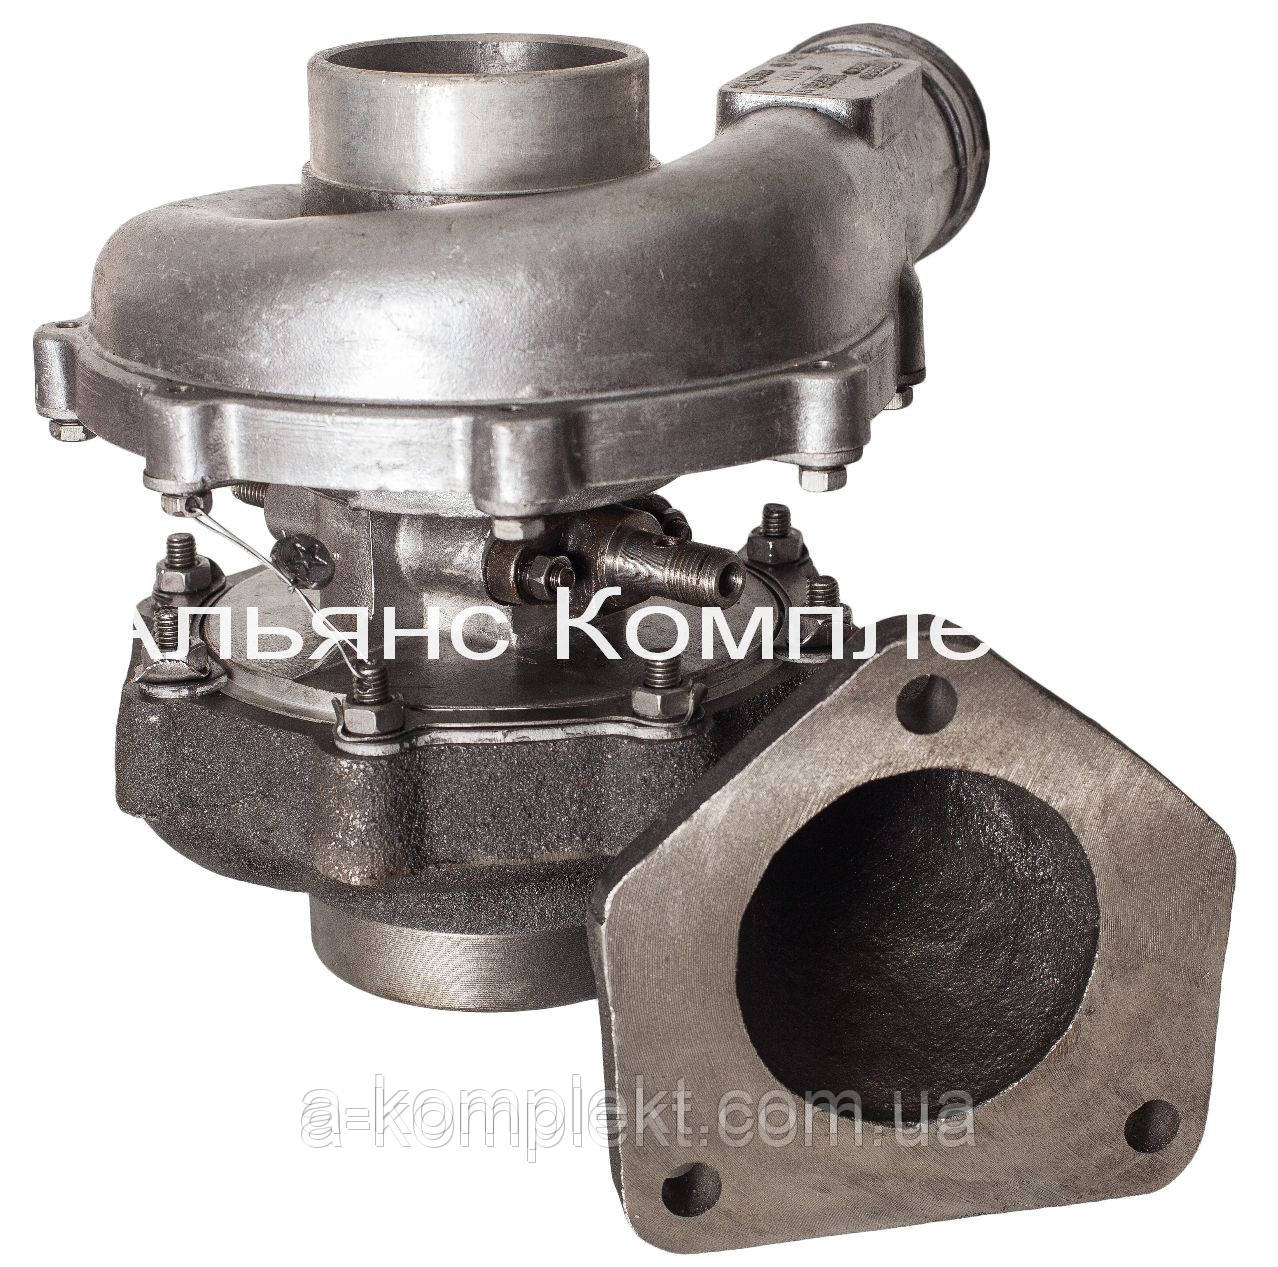 Турбокомпрессор ТКР 8,5 С1 (800.000)